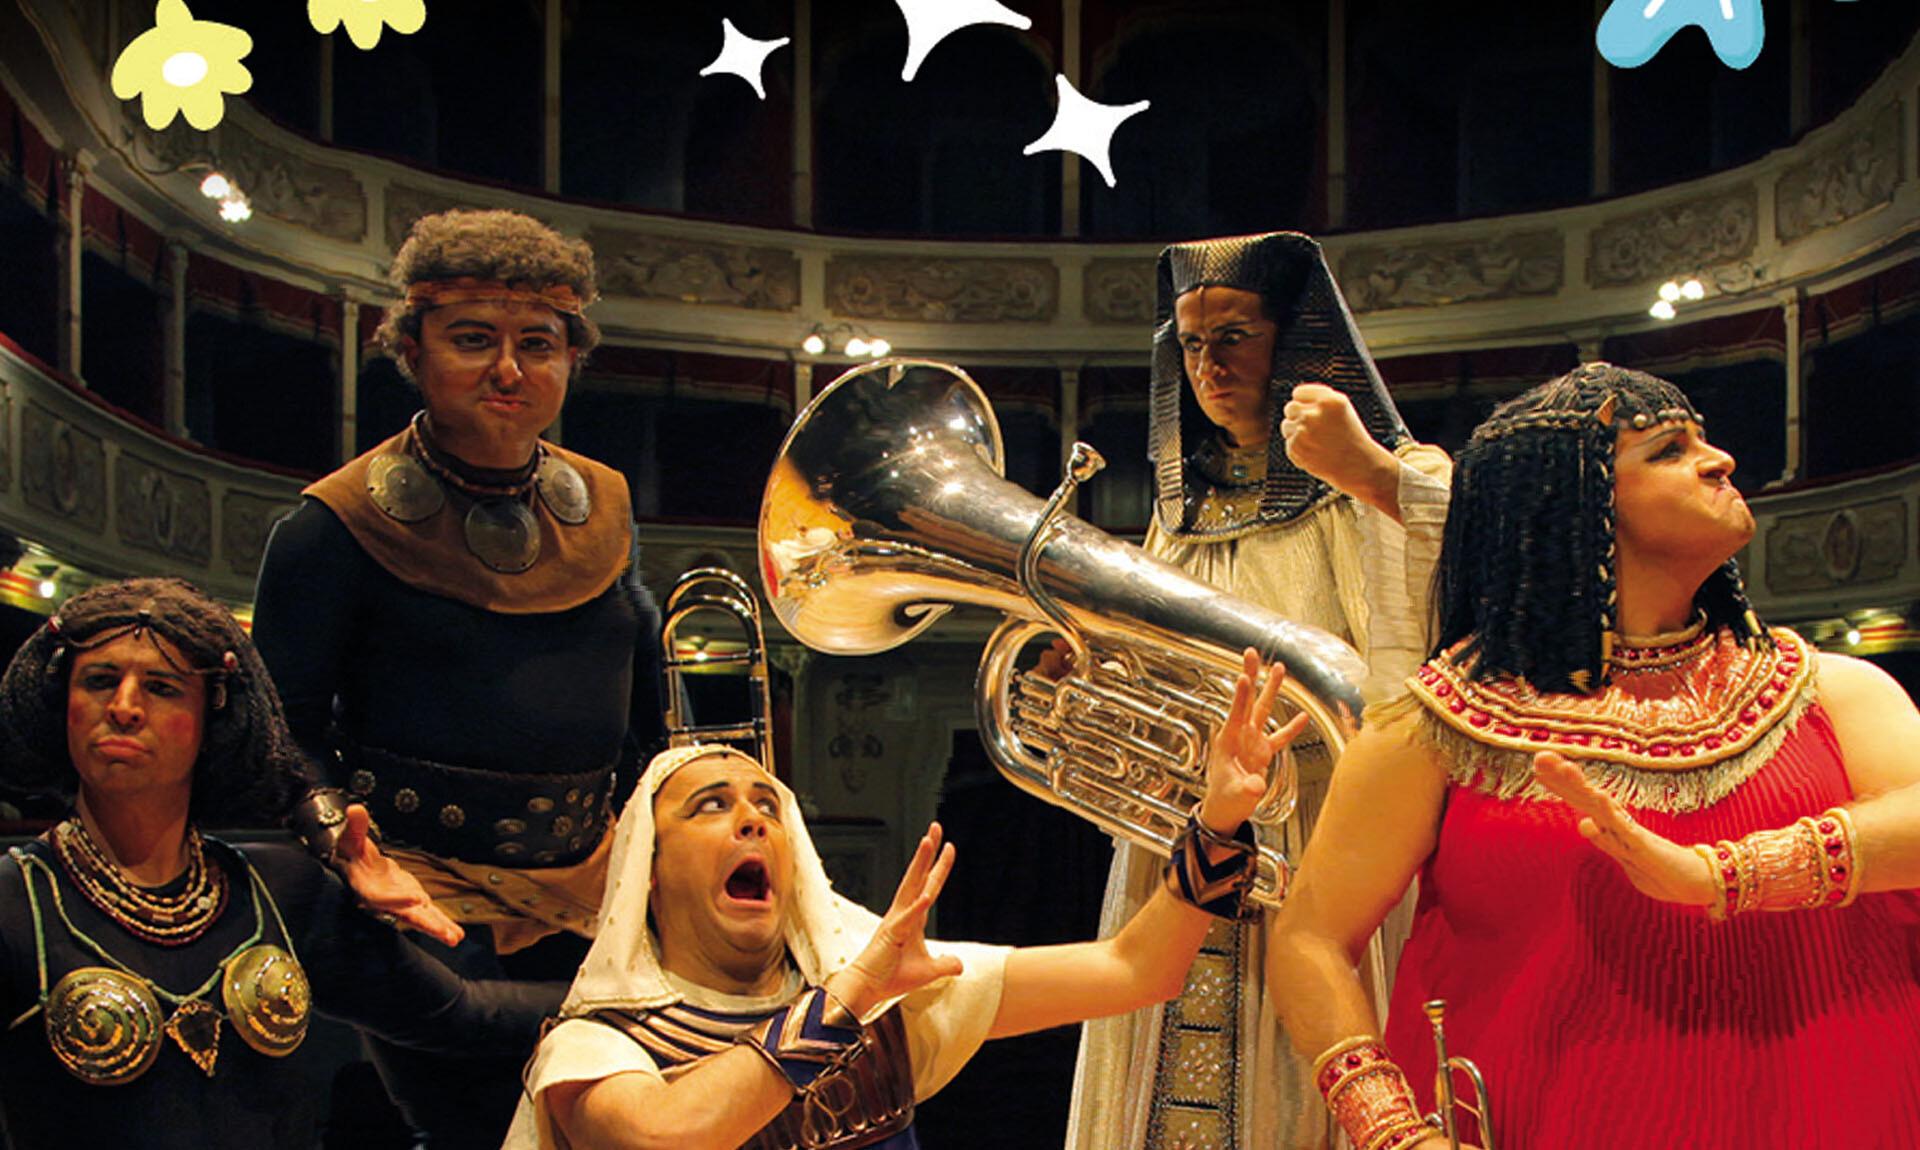 Festival Verdi 2019: Aida in 55 minuti  Spettacolo musicale tratto da Aida di Giuseppe Verdi